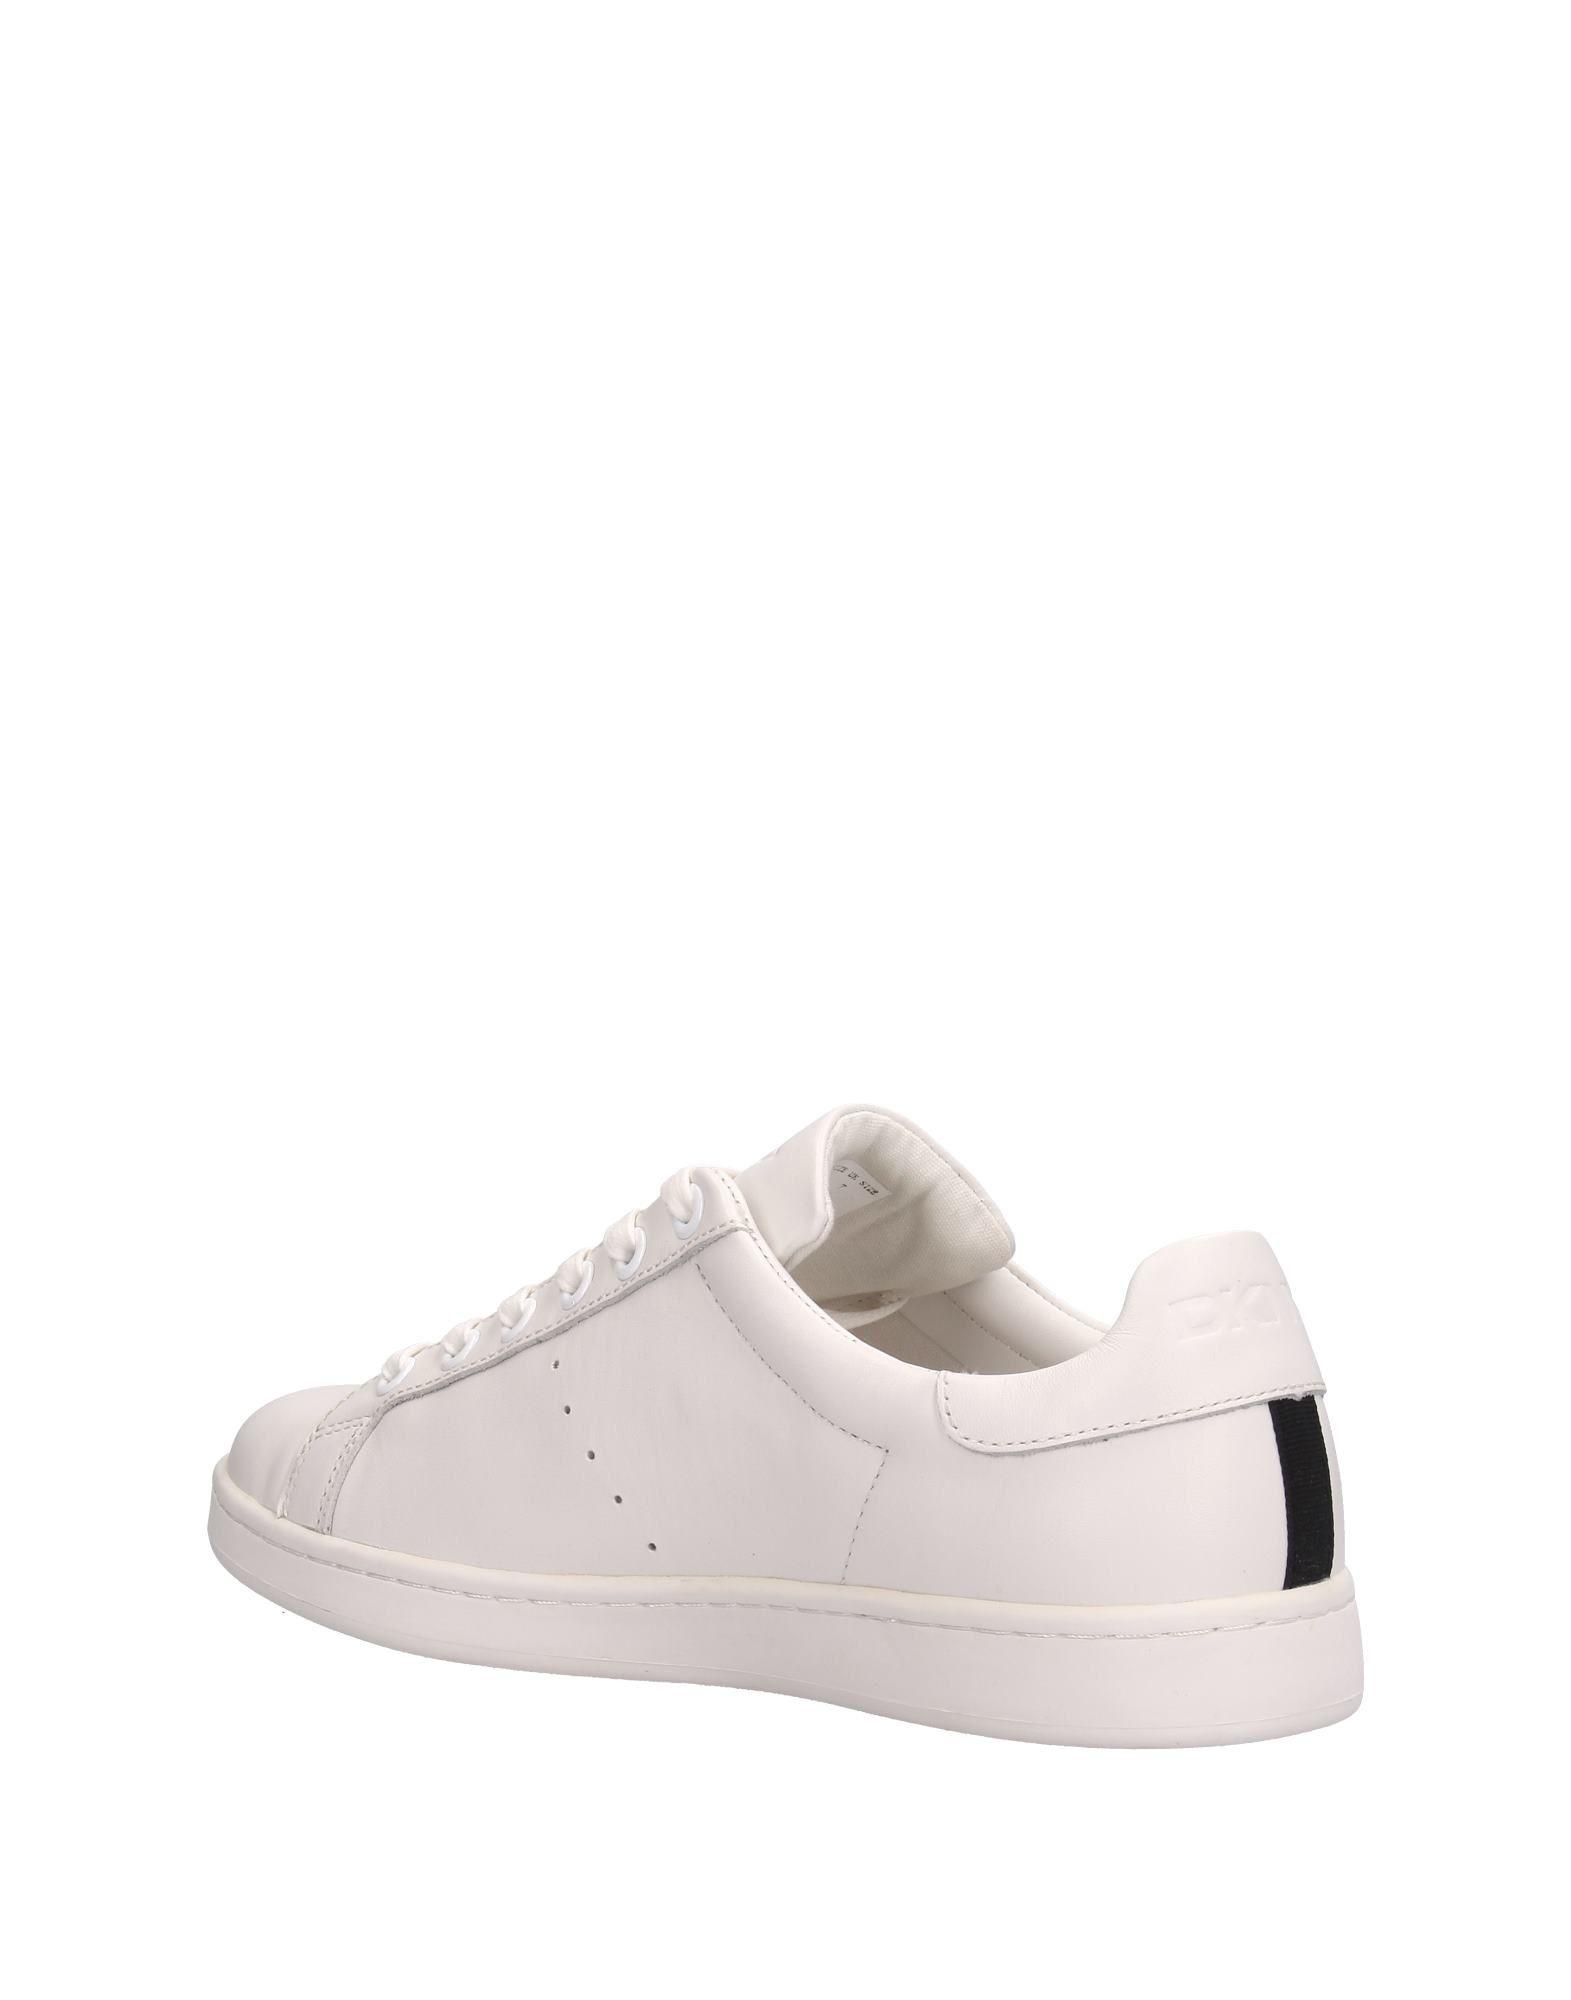 Dkny Sneakers Sneakers Dkny Herren  11207992NB a81154